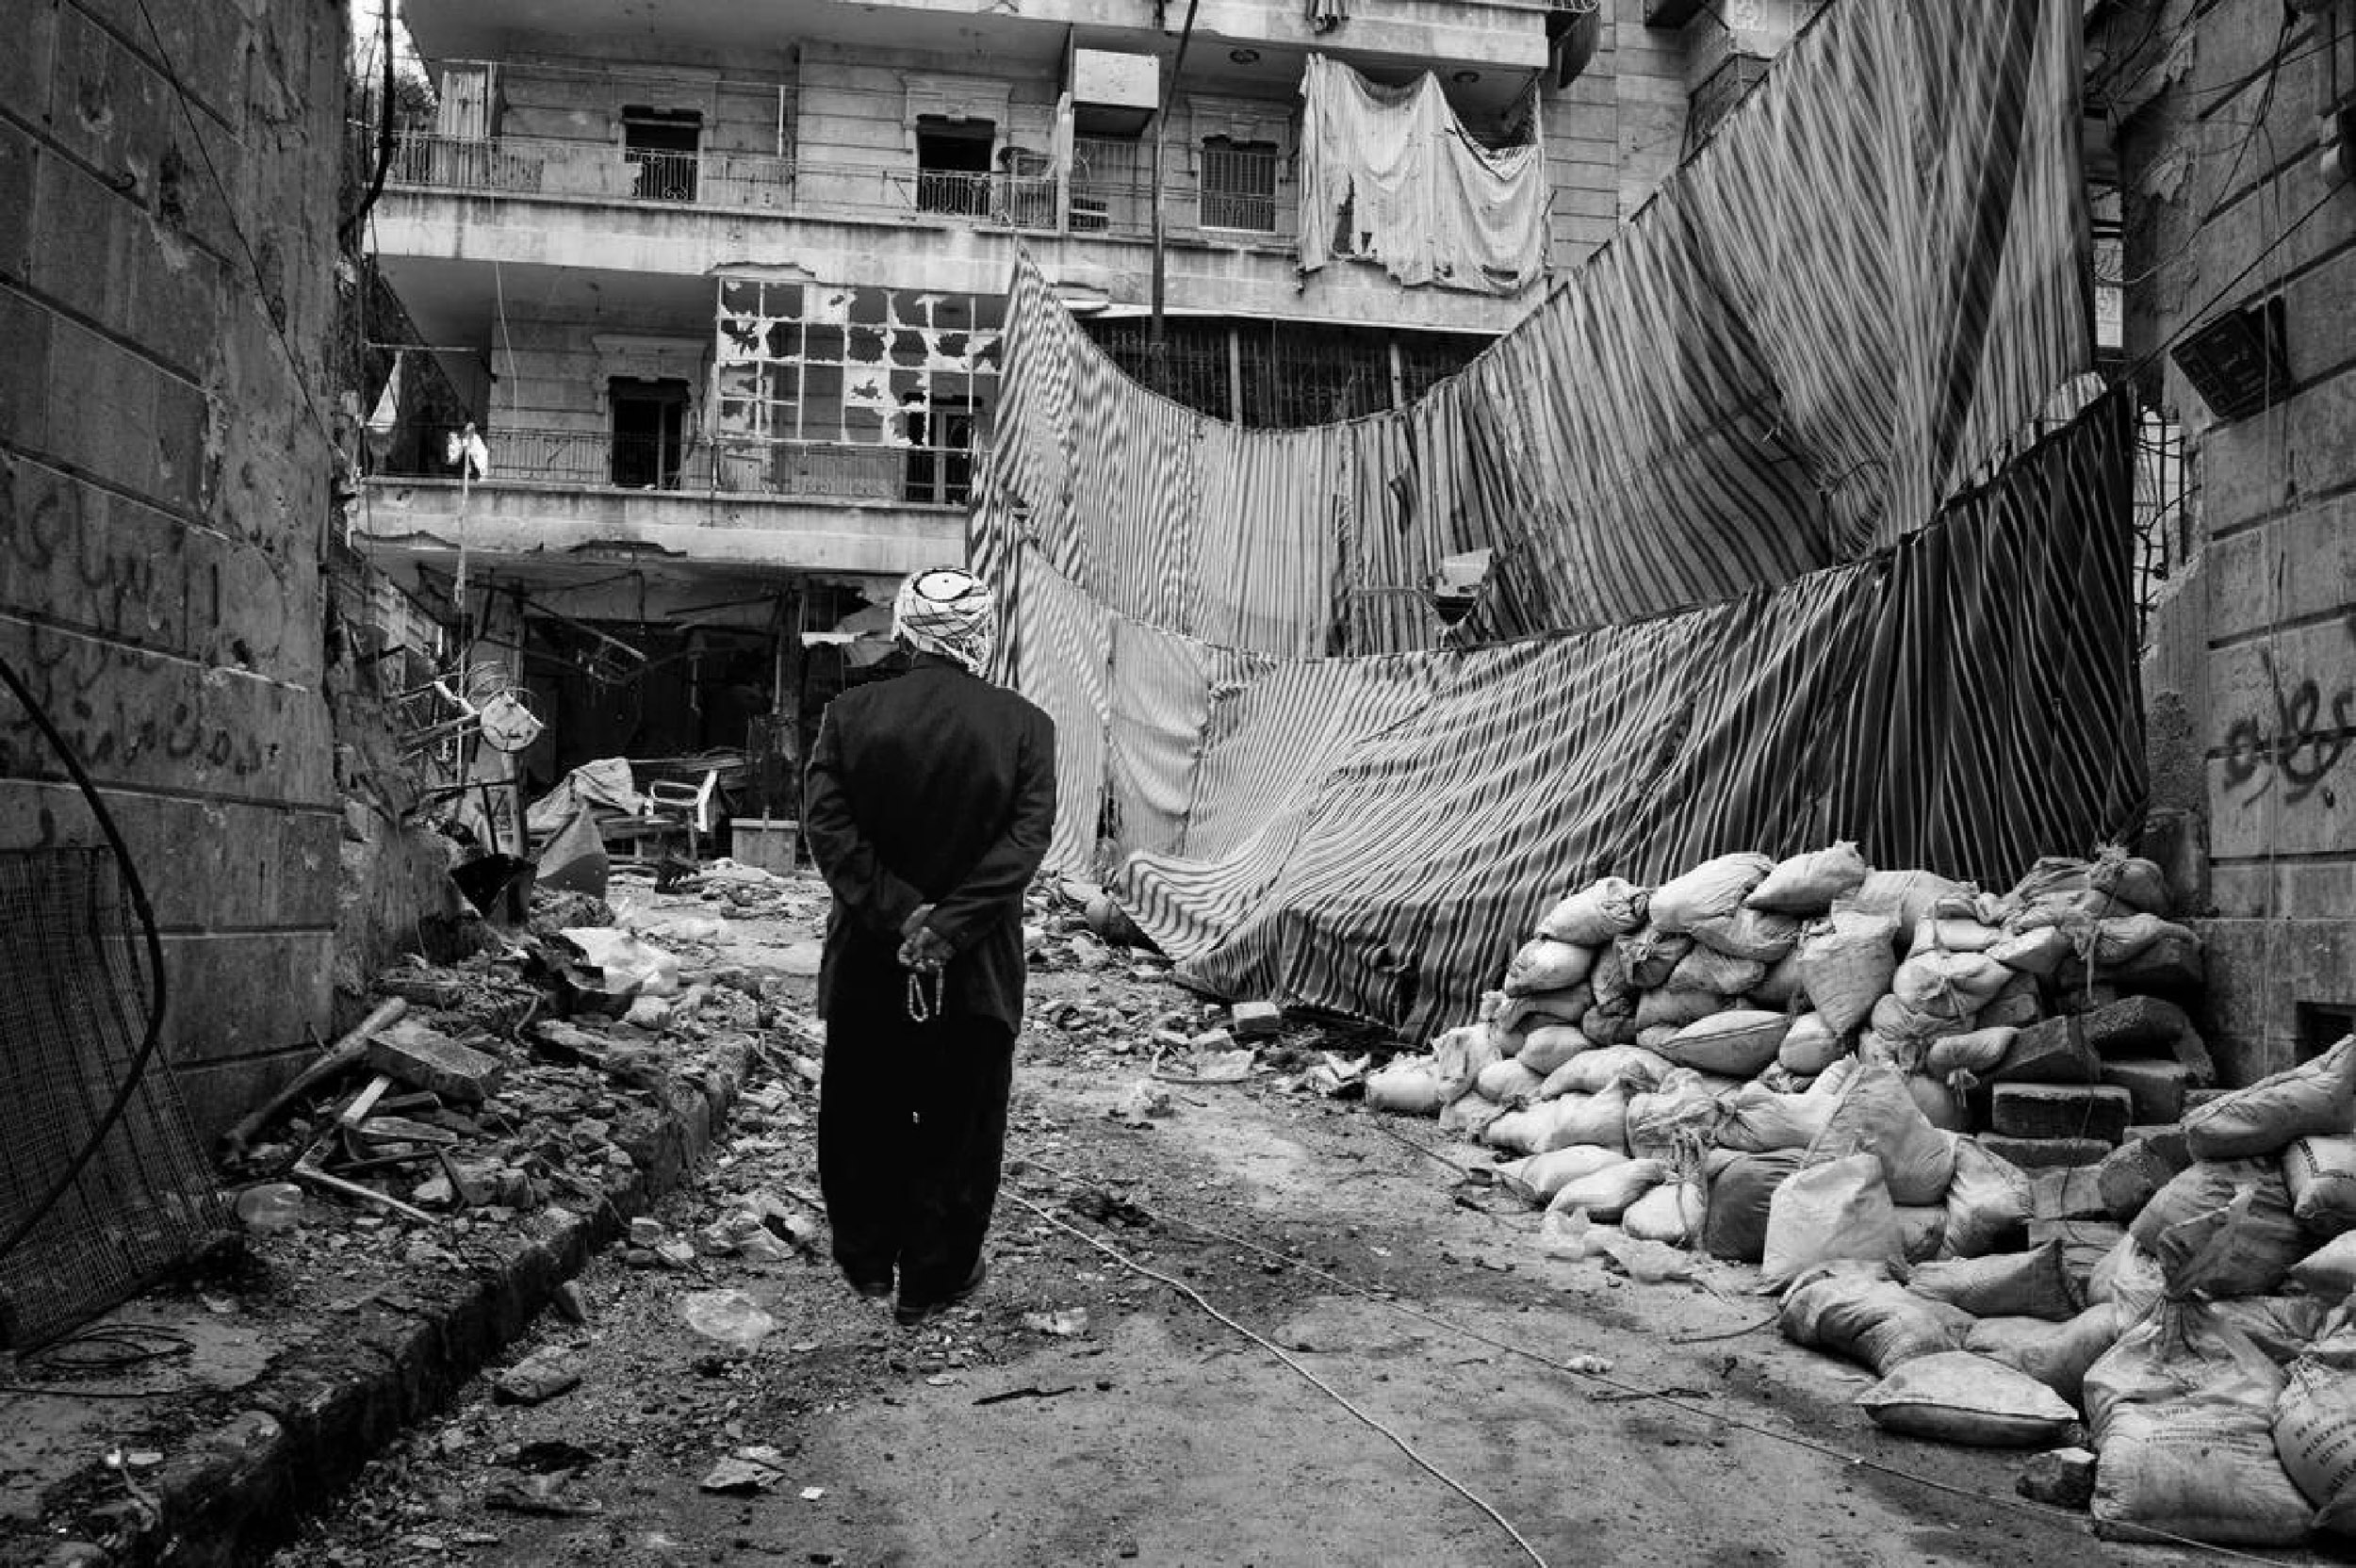 Categorie: Fine Art, Reportage, Street, Light Painting - Photographer: KAMIAR HOSEINIPOUR - Location: Mahabad, Iran